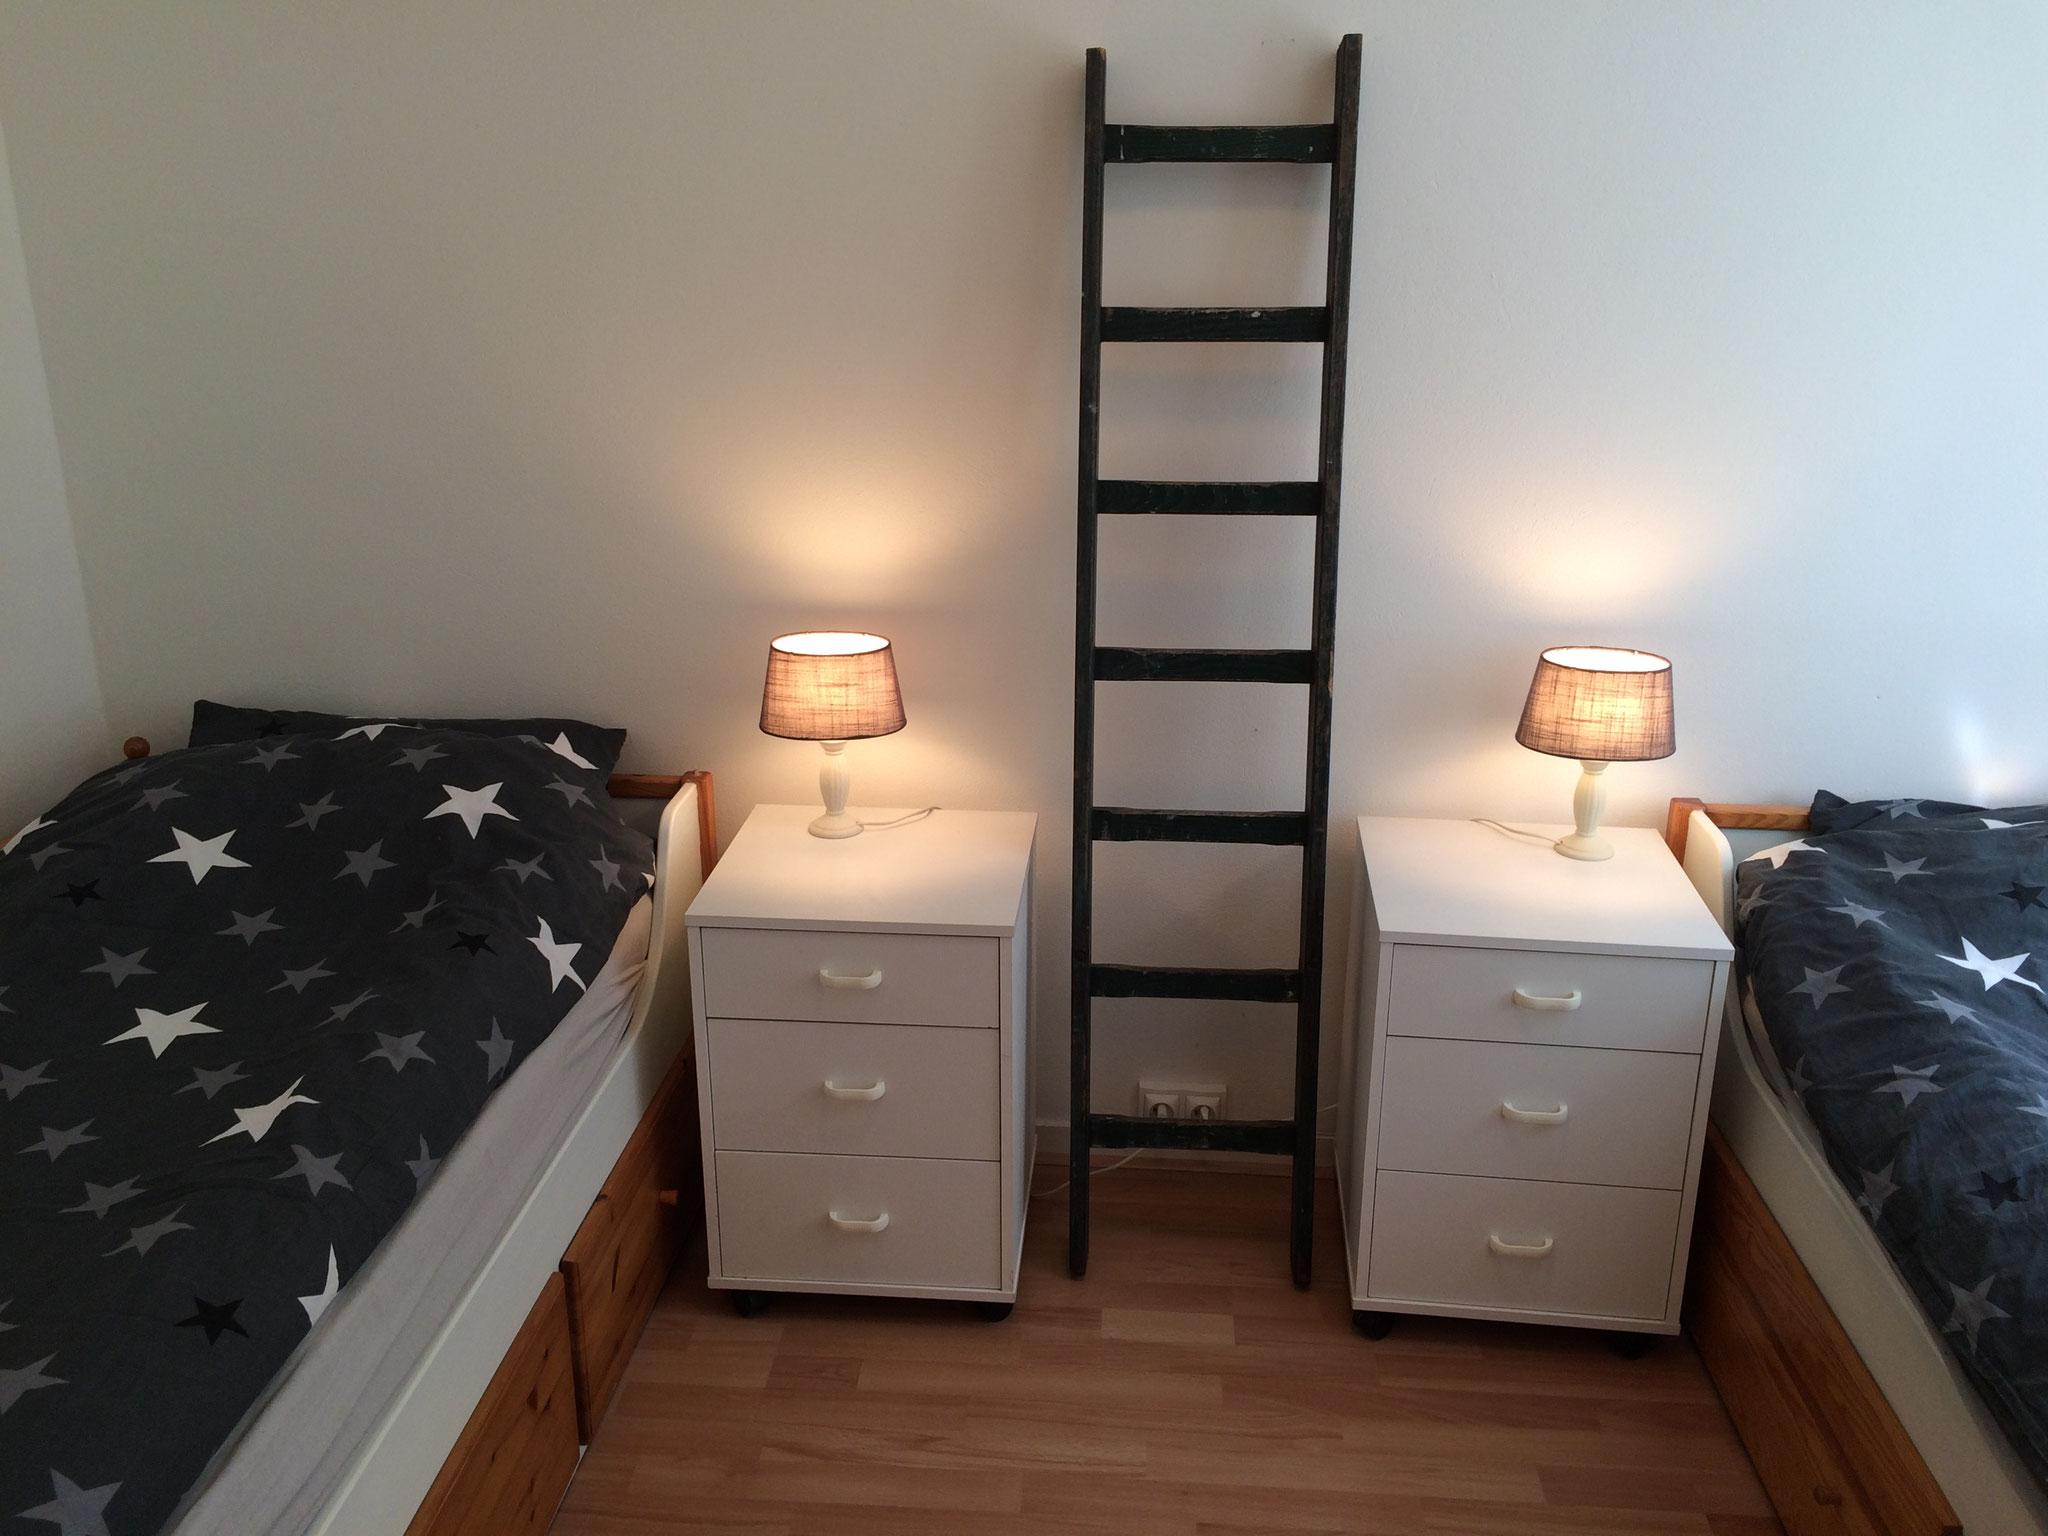 Slaapkamer 3: 2 losse bedden